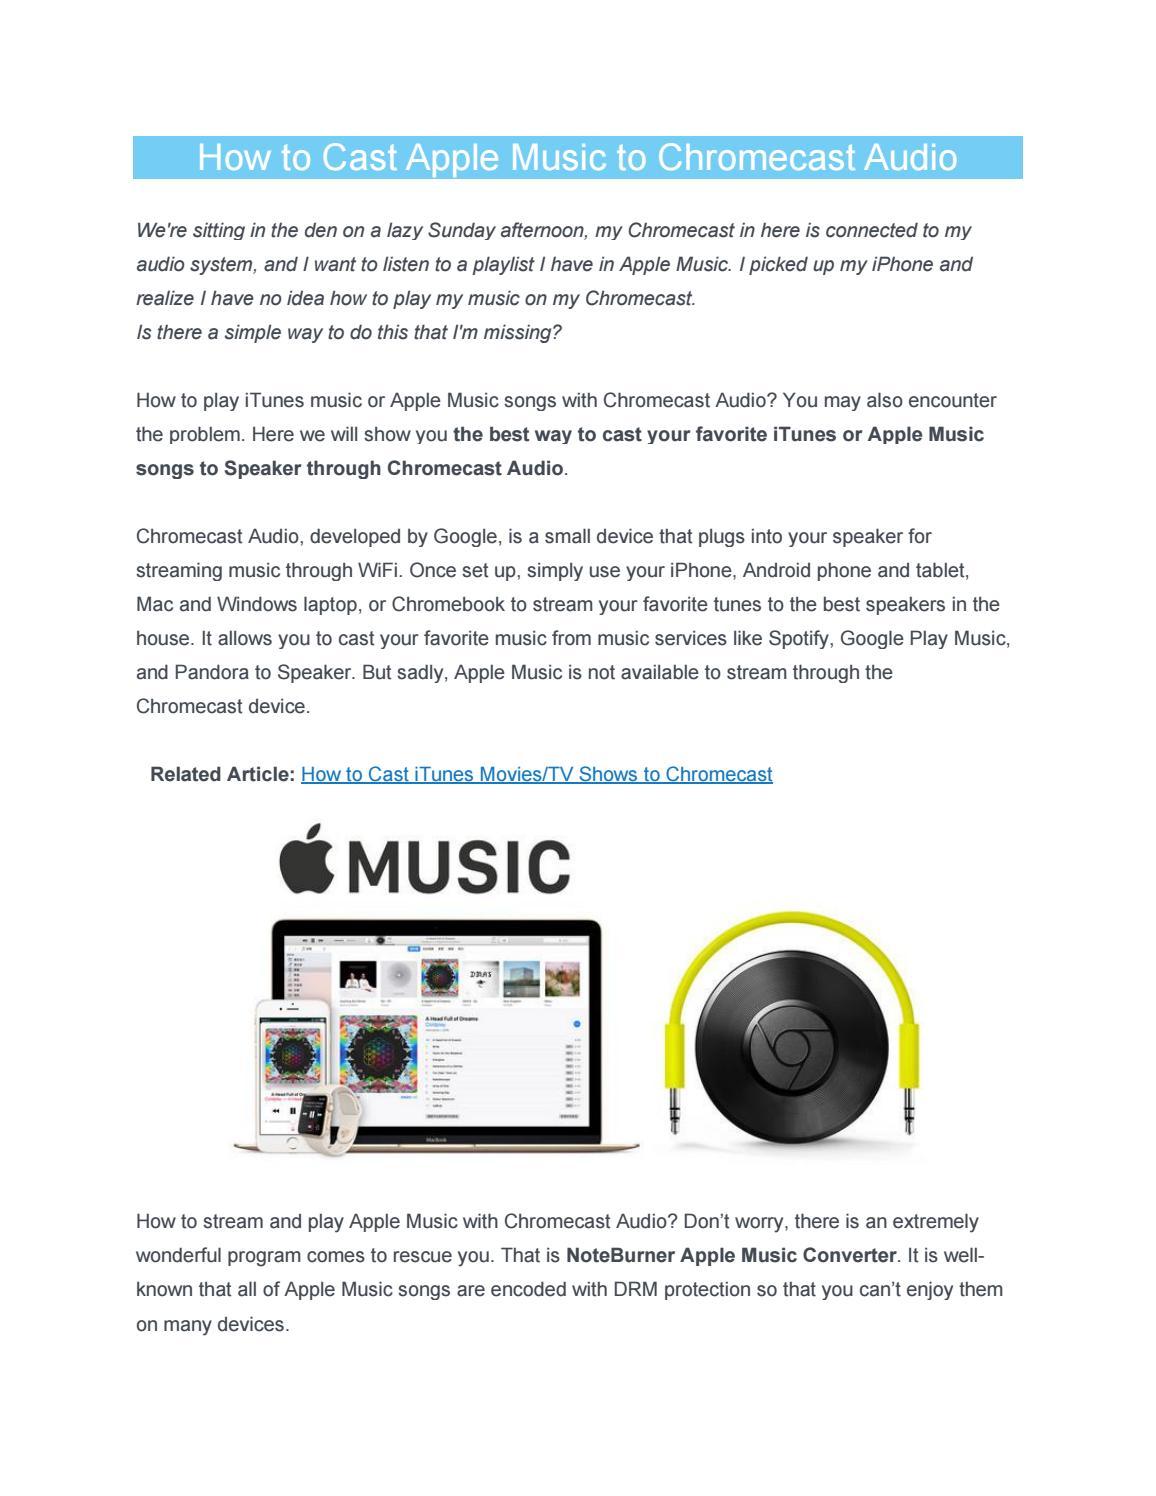 How to Cast Apple Music to Chromecast Audio by Joe Gromny